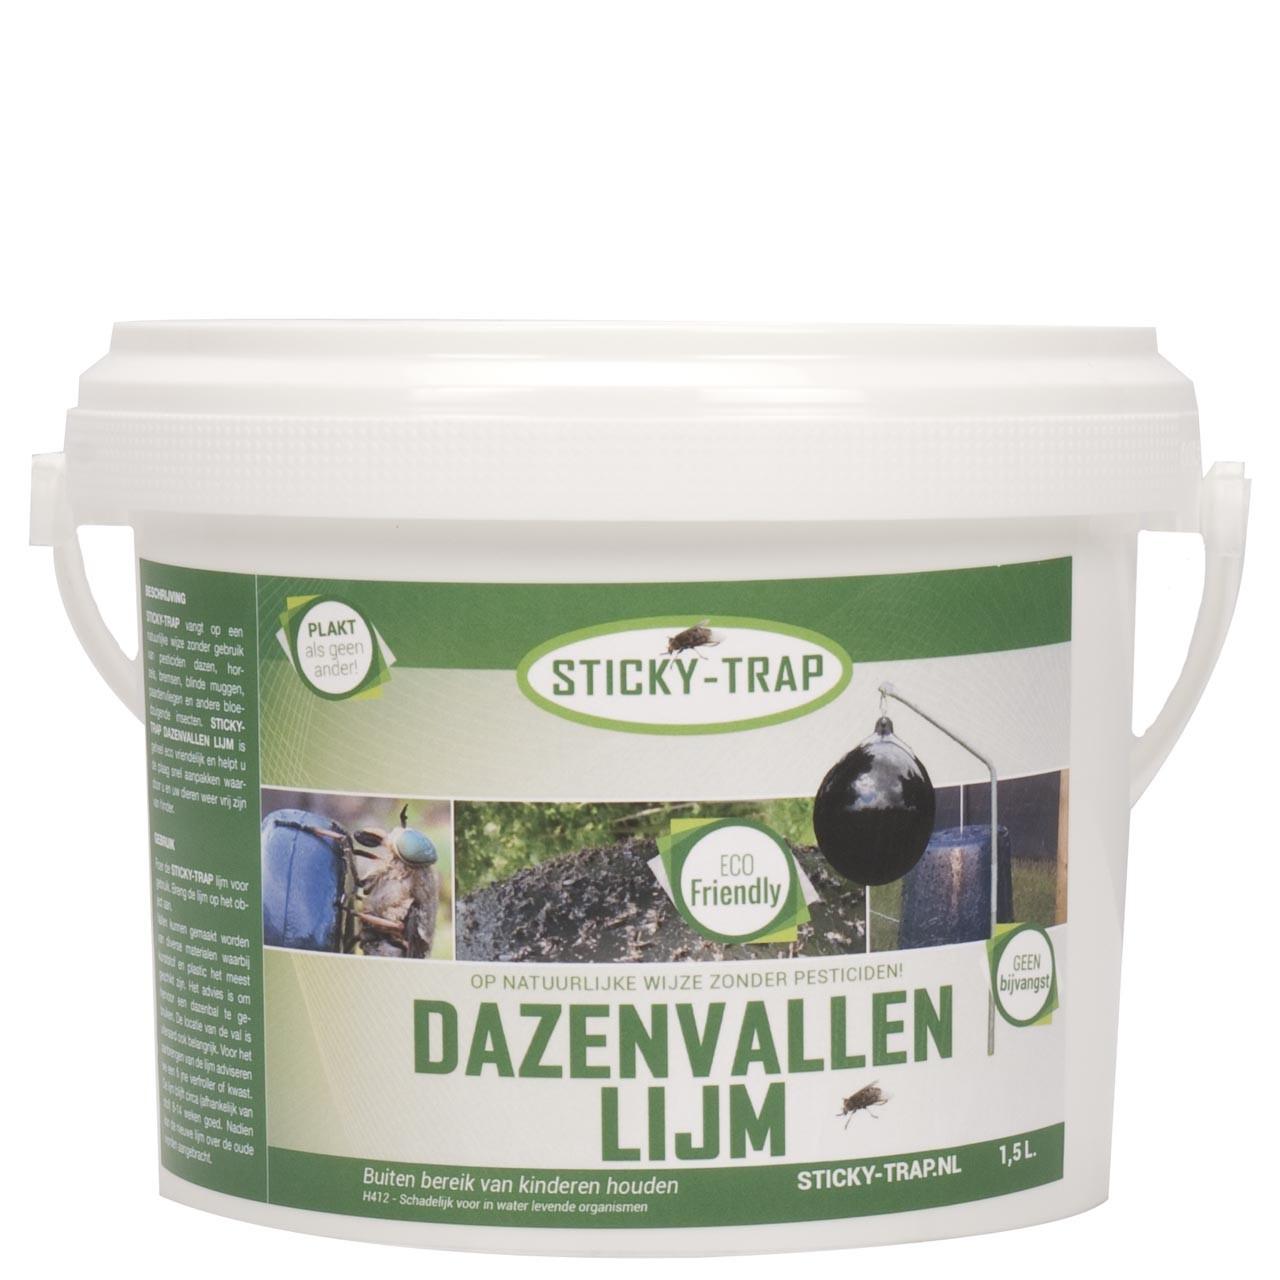 Sticky-Trap dazenlijm 1,5L